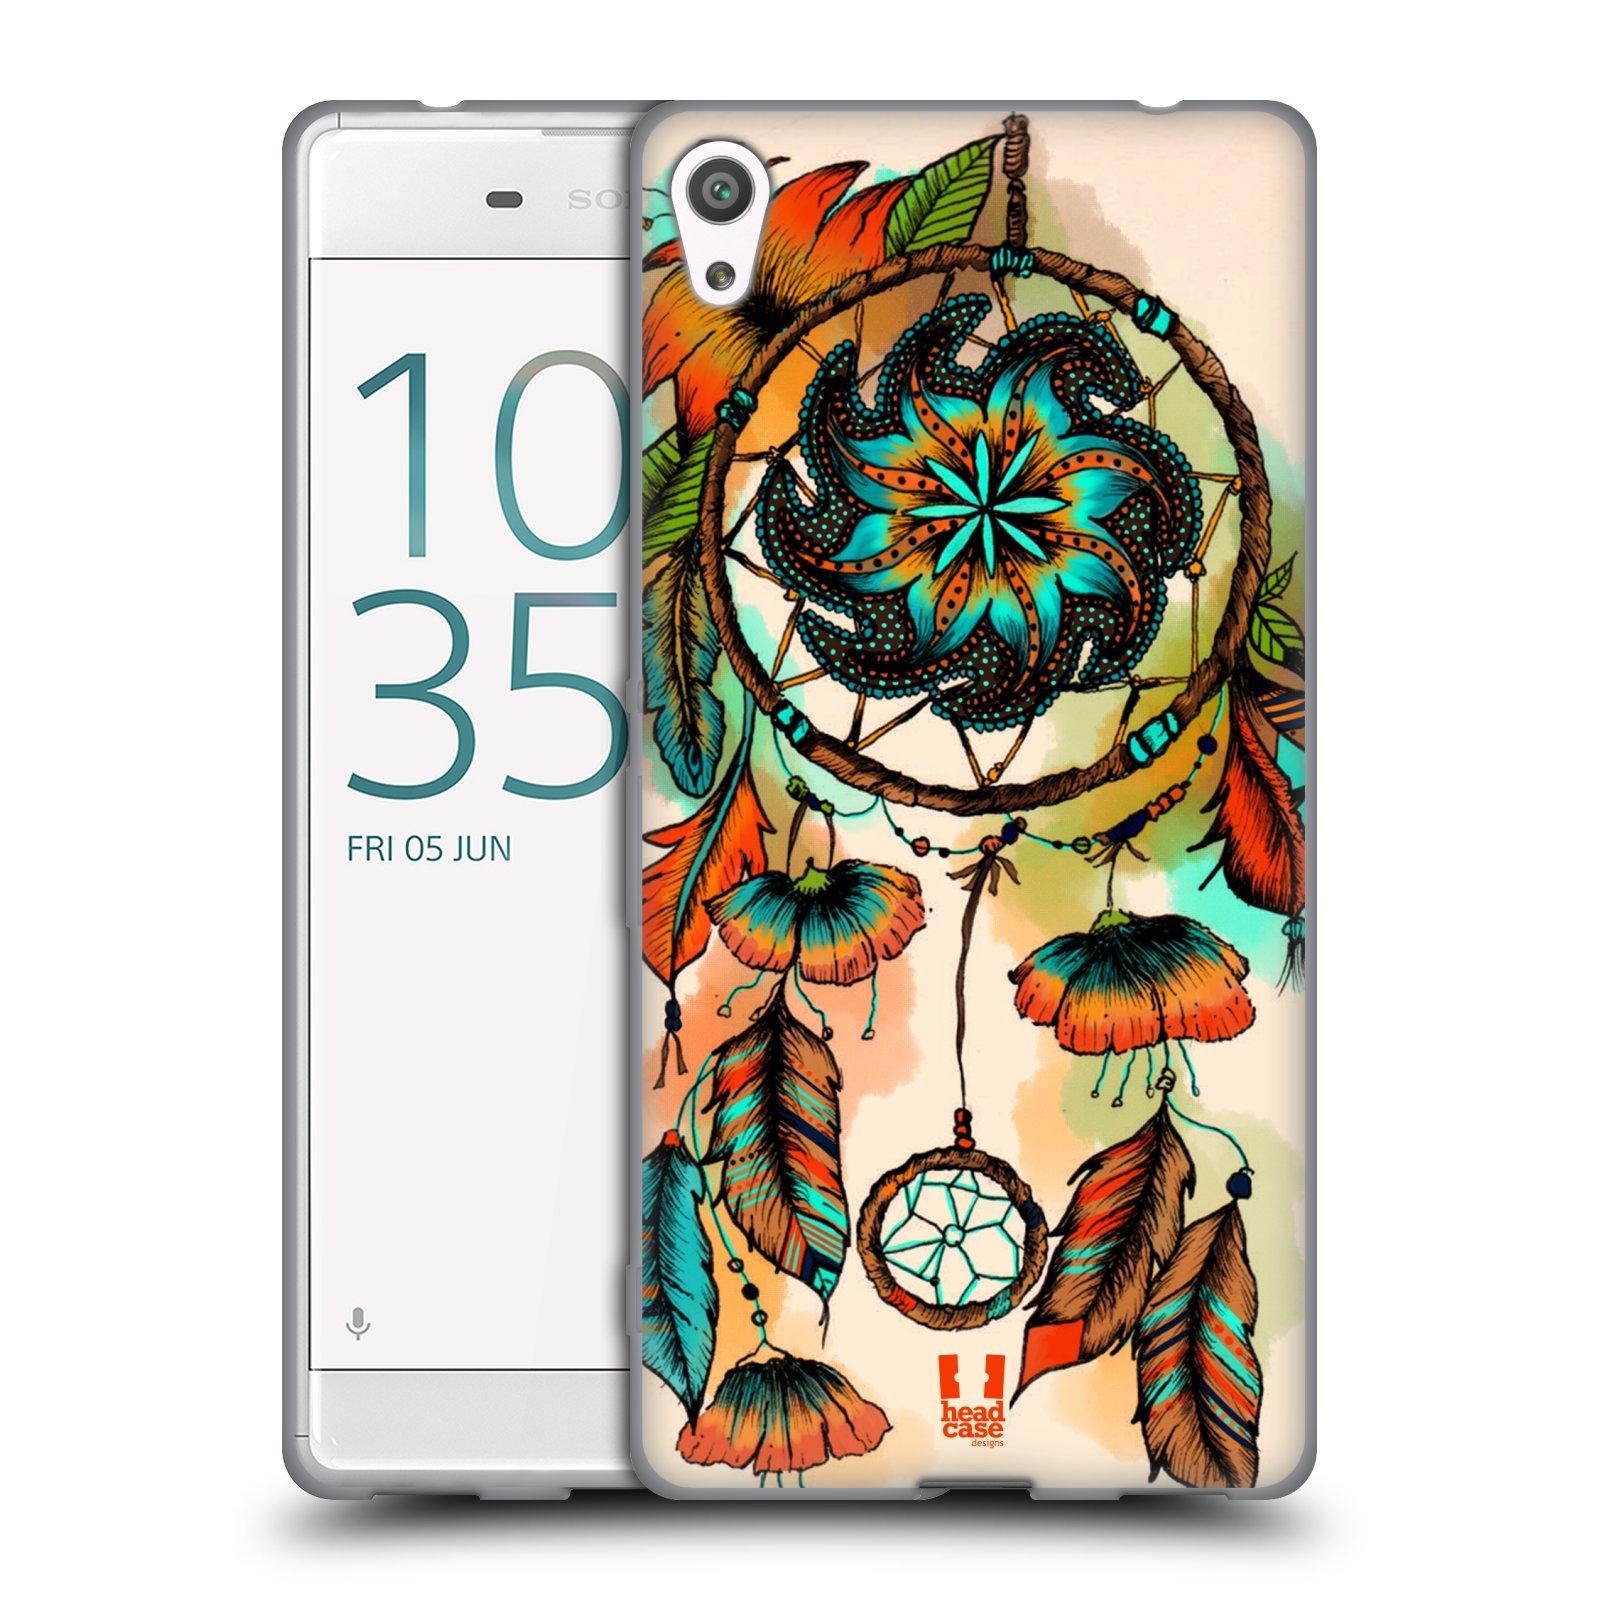 Silikonové pouzdro na mobil Sony Xperia XA Ultra HEAD CASE BLOOM APRICOT